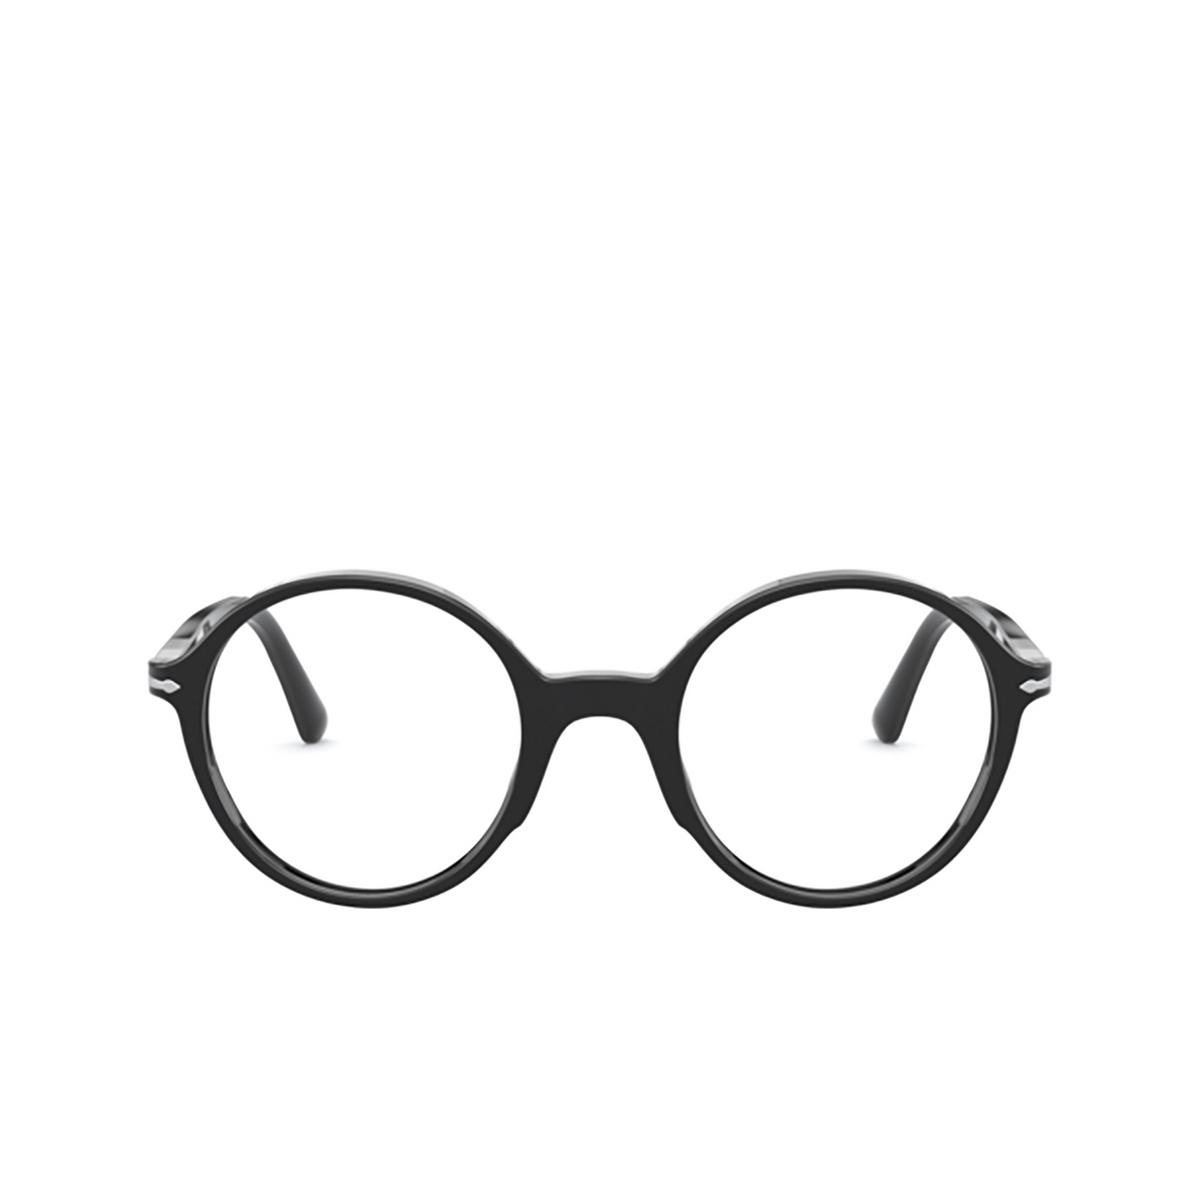 Persol® Round Eyeglasses: PO3249V color Black 95 - front view.